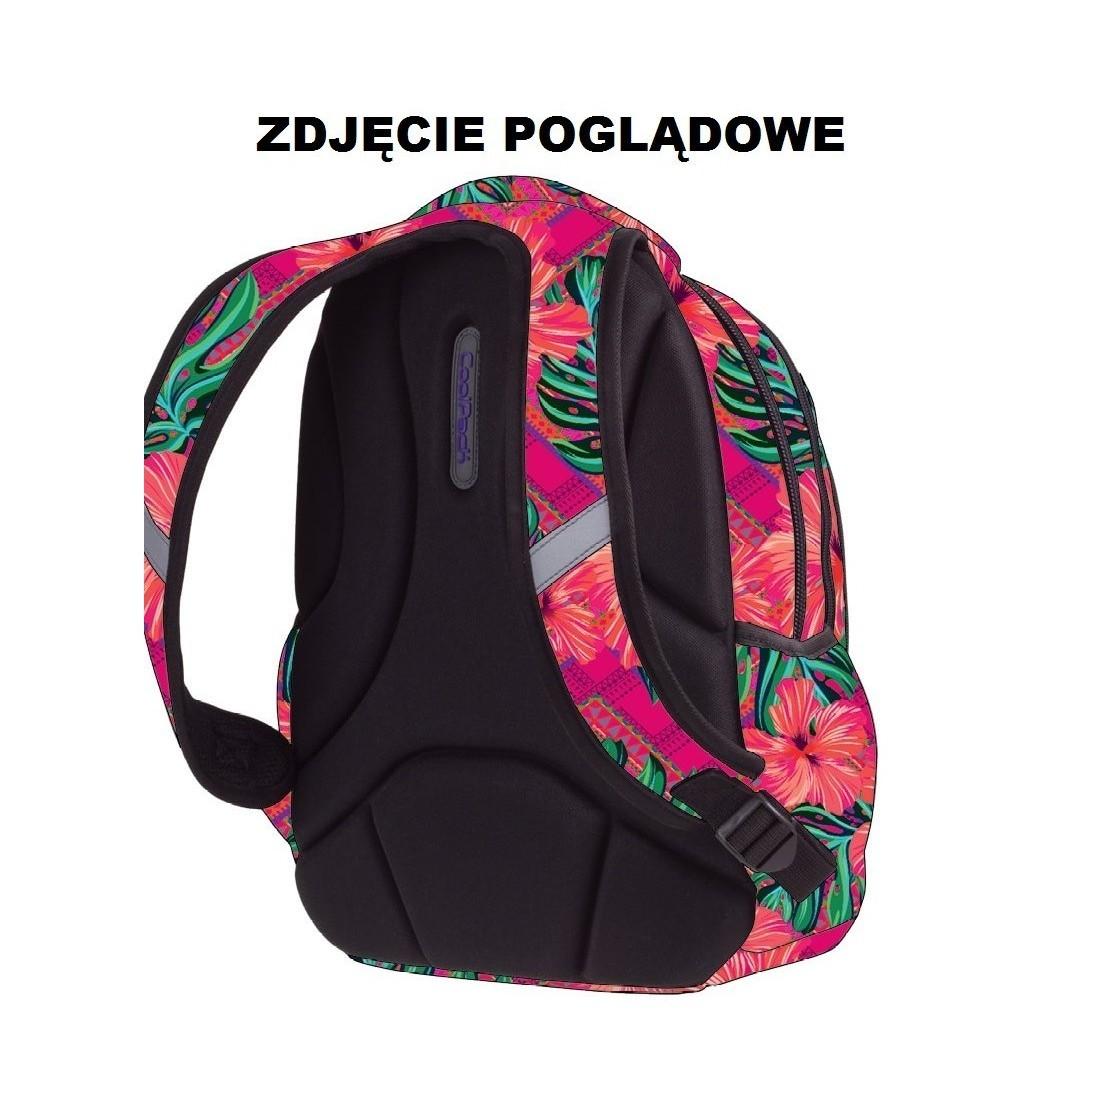 d694700beb0dd ... CoolPack CP PRIME BOHO ELECTRA Aztec Boho plecak dla pierwszoklasisty azteckie  wzory - 1061